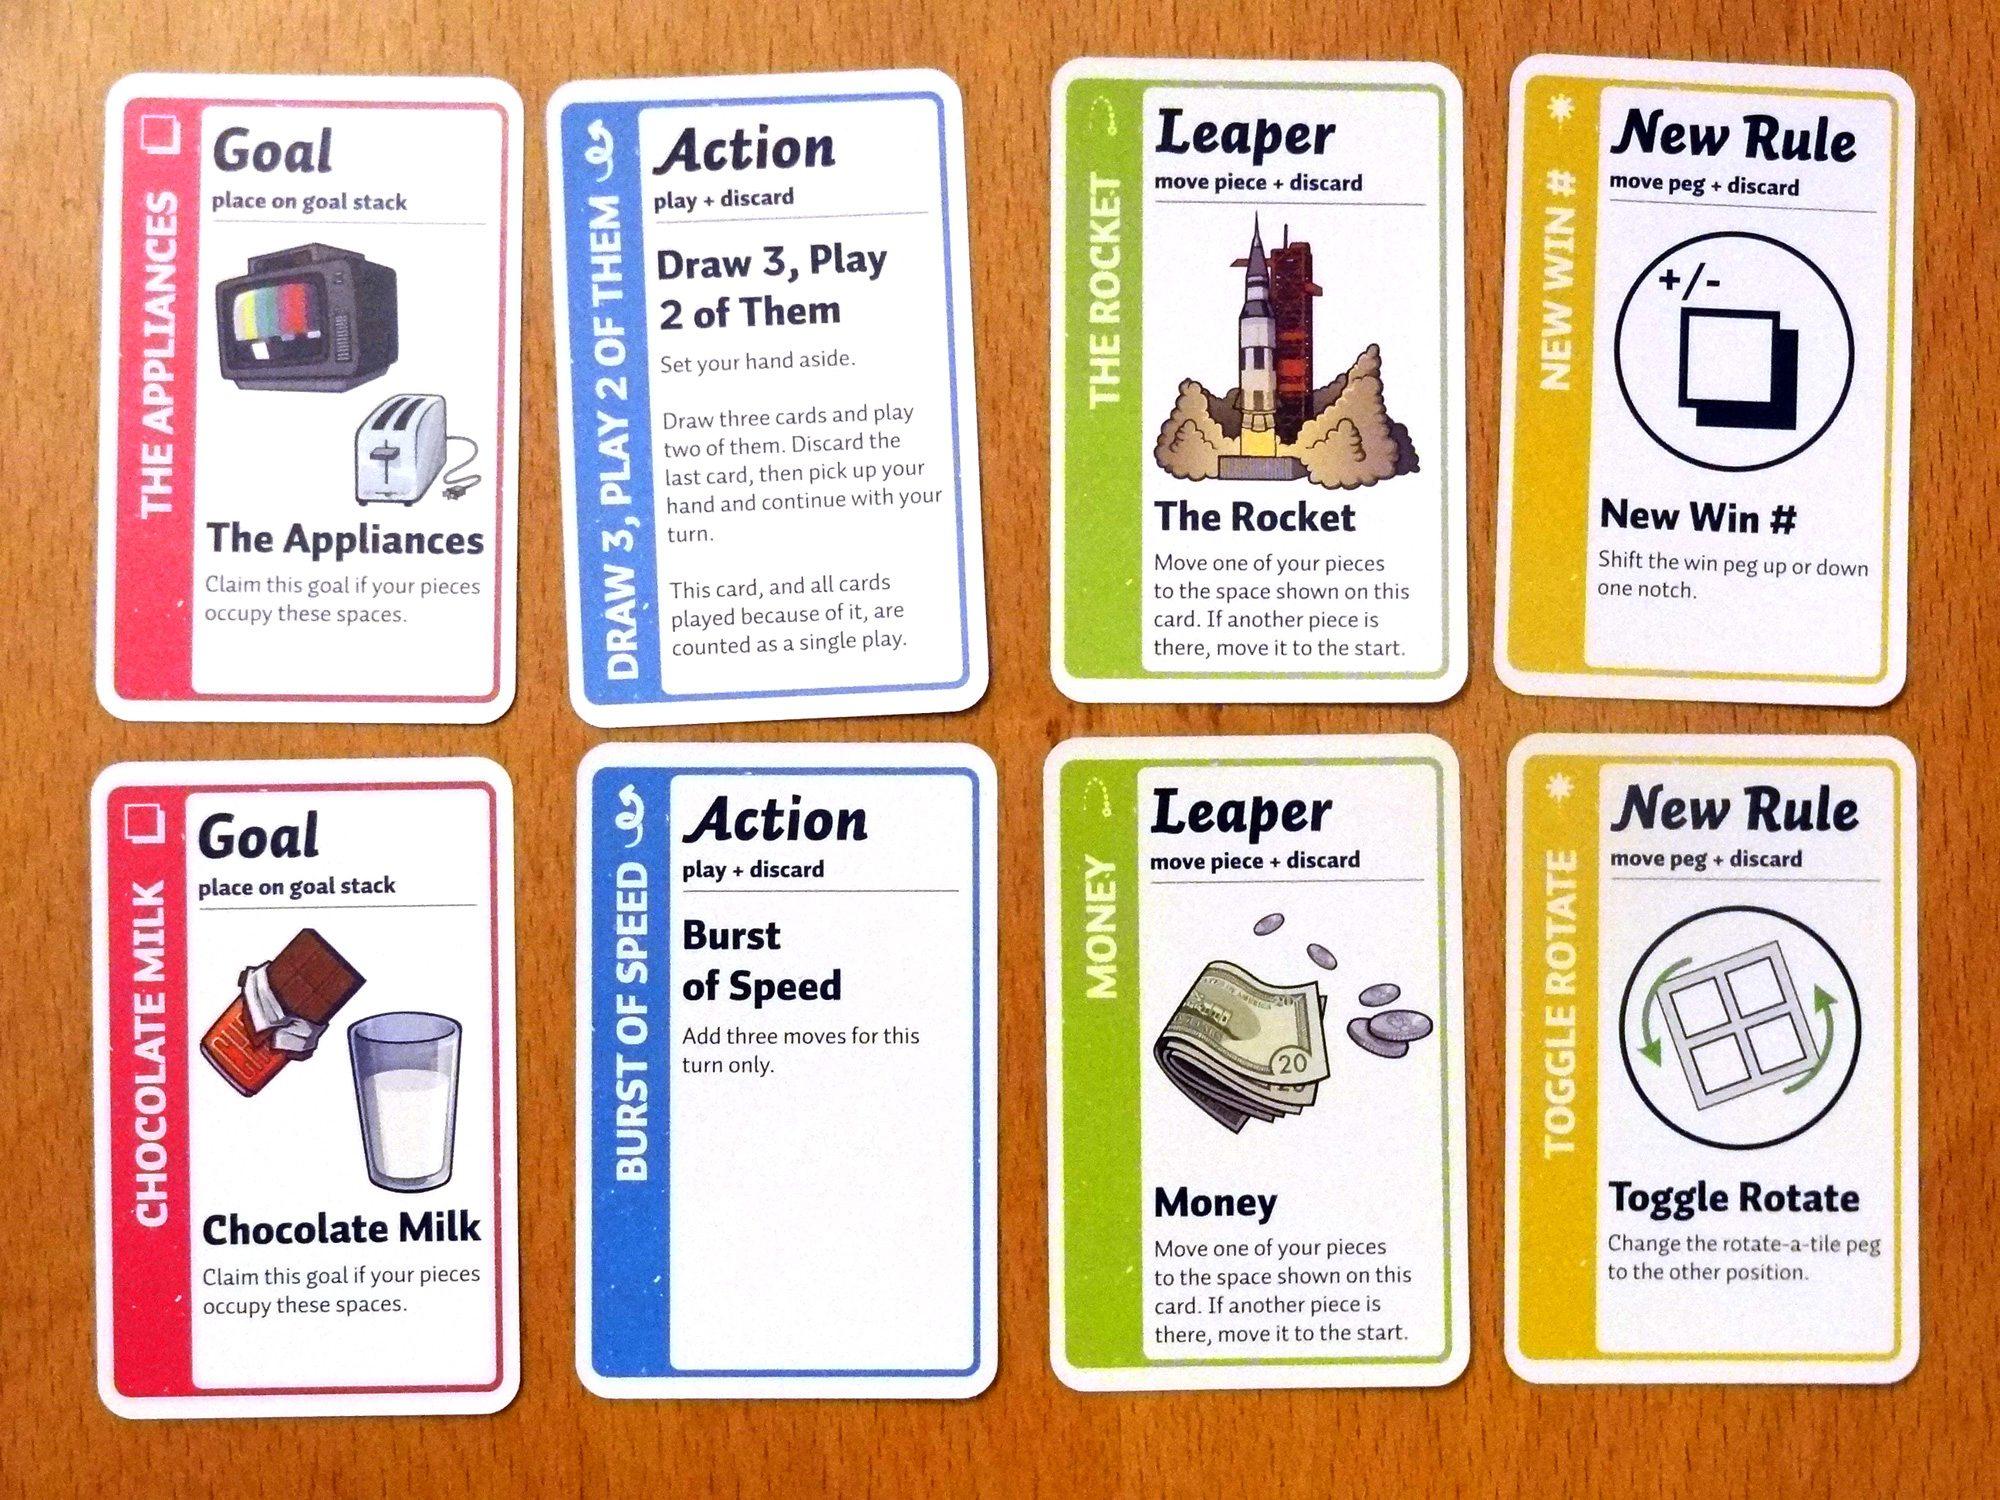 Fluxx Board Game cards